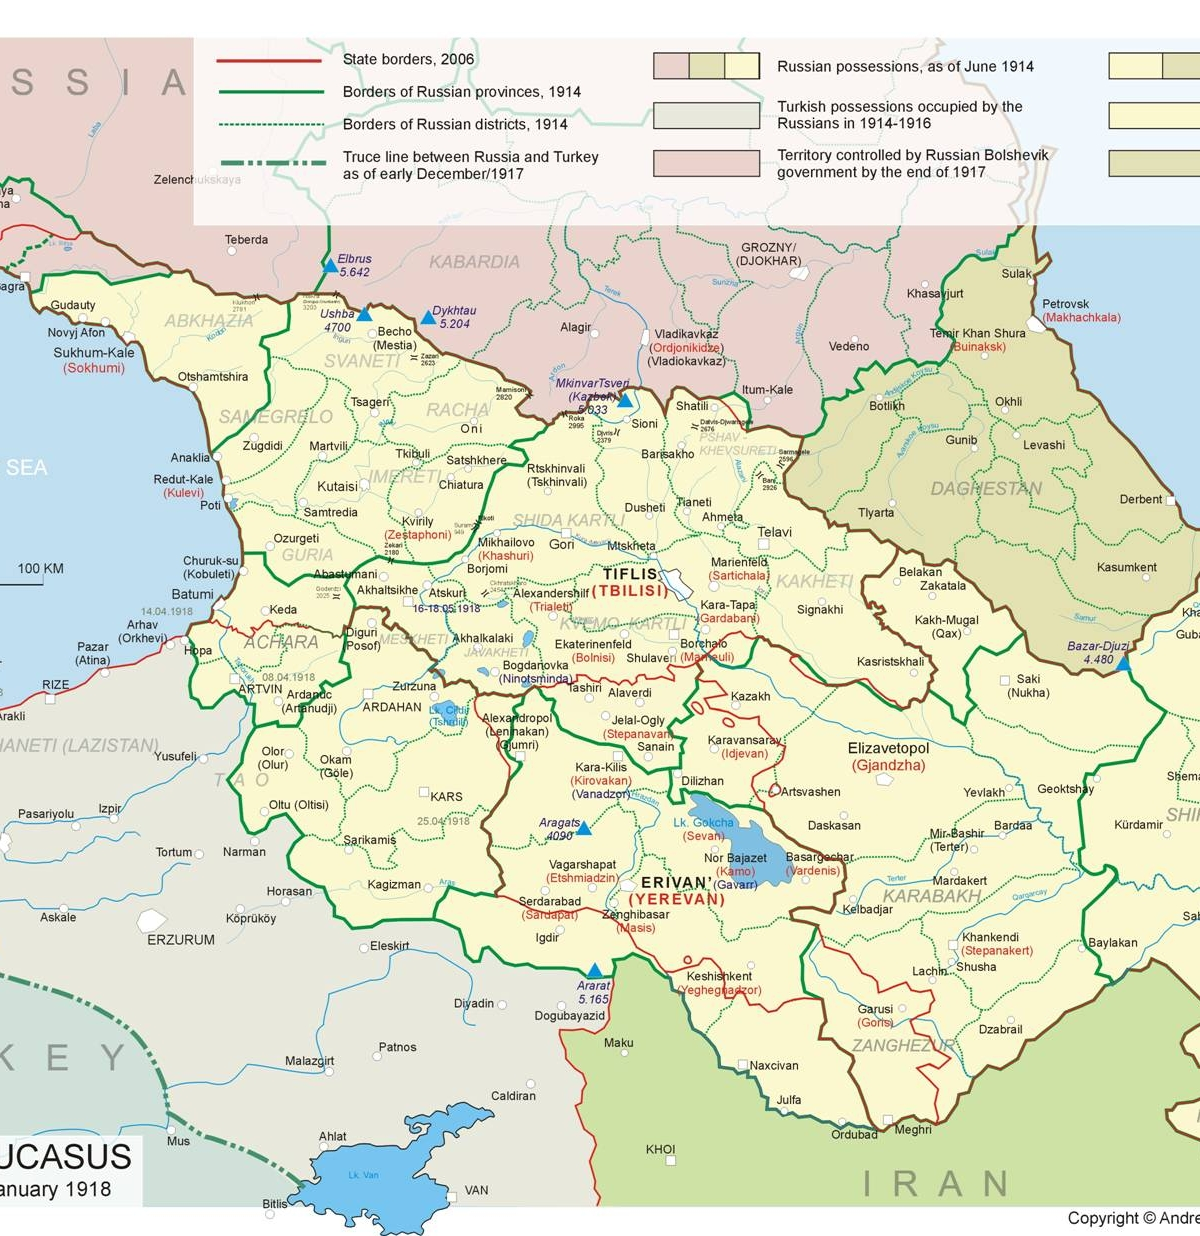 southcaucasus_1917